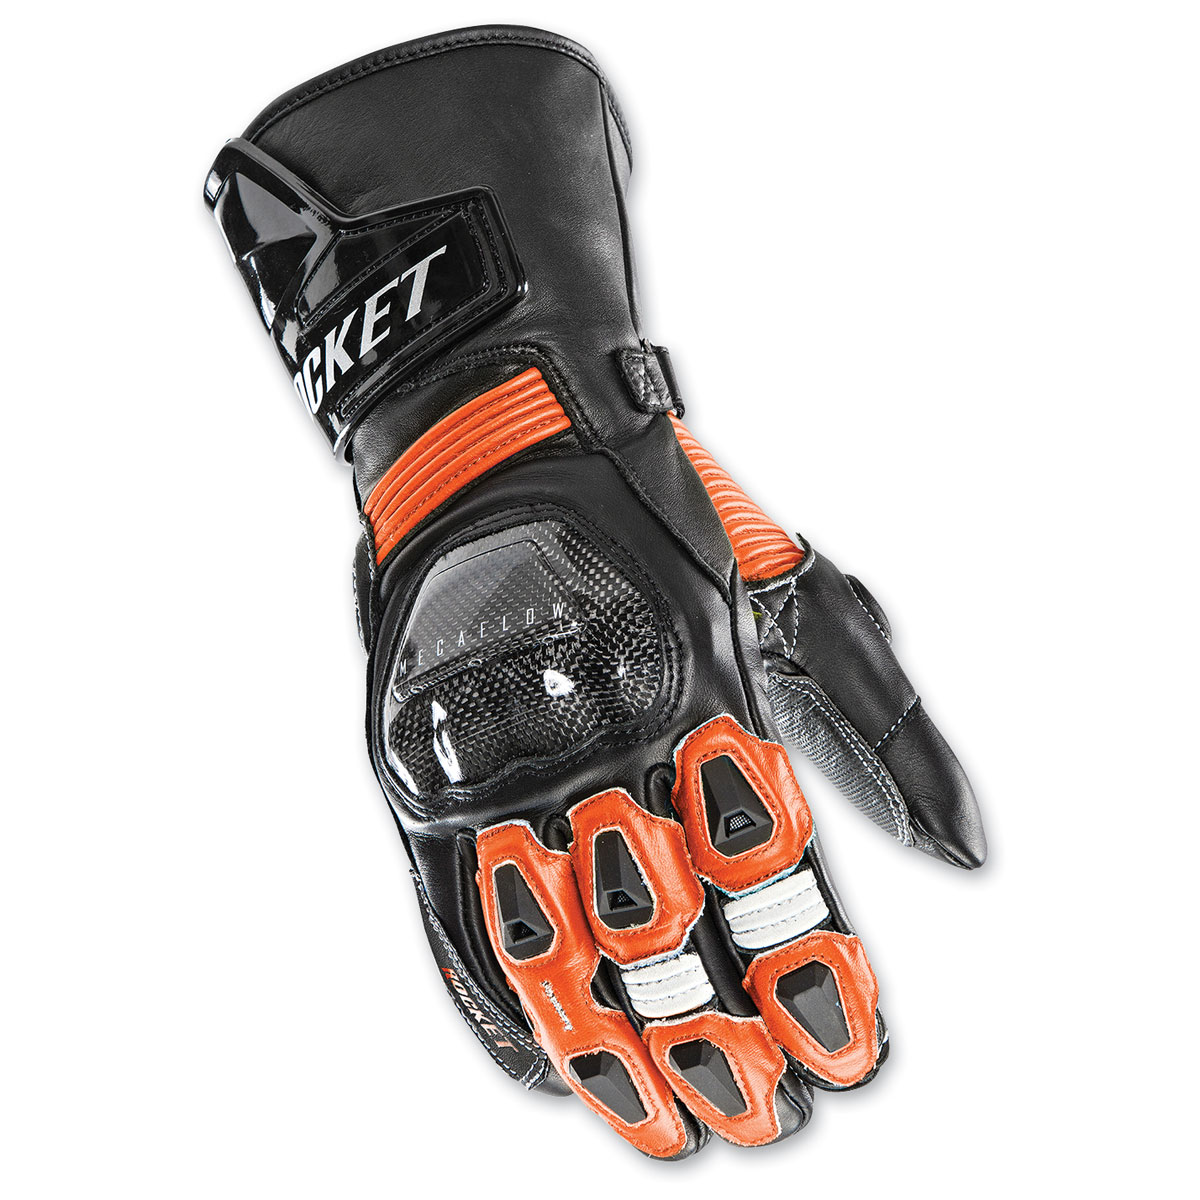 Joe Rocket Men's GPX Black/Orange Gloves